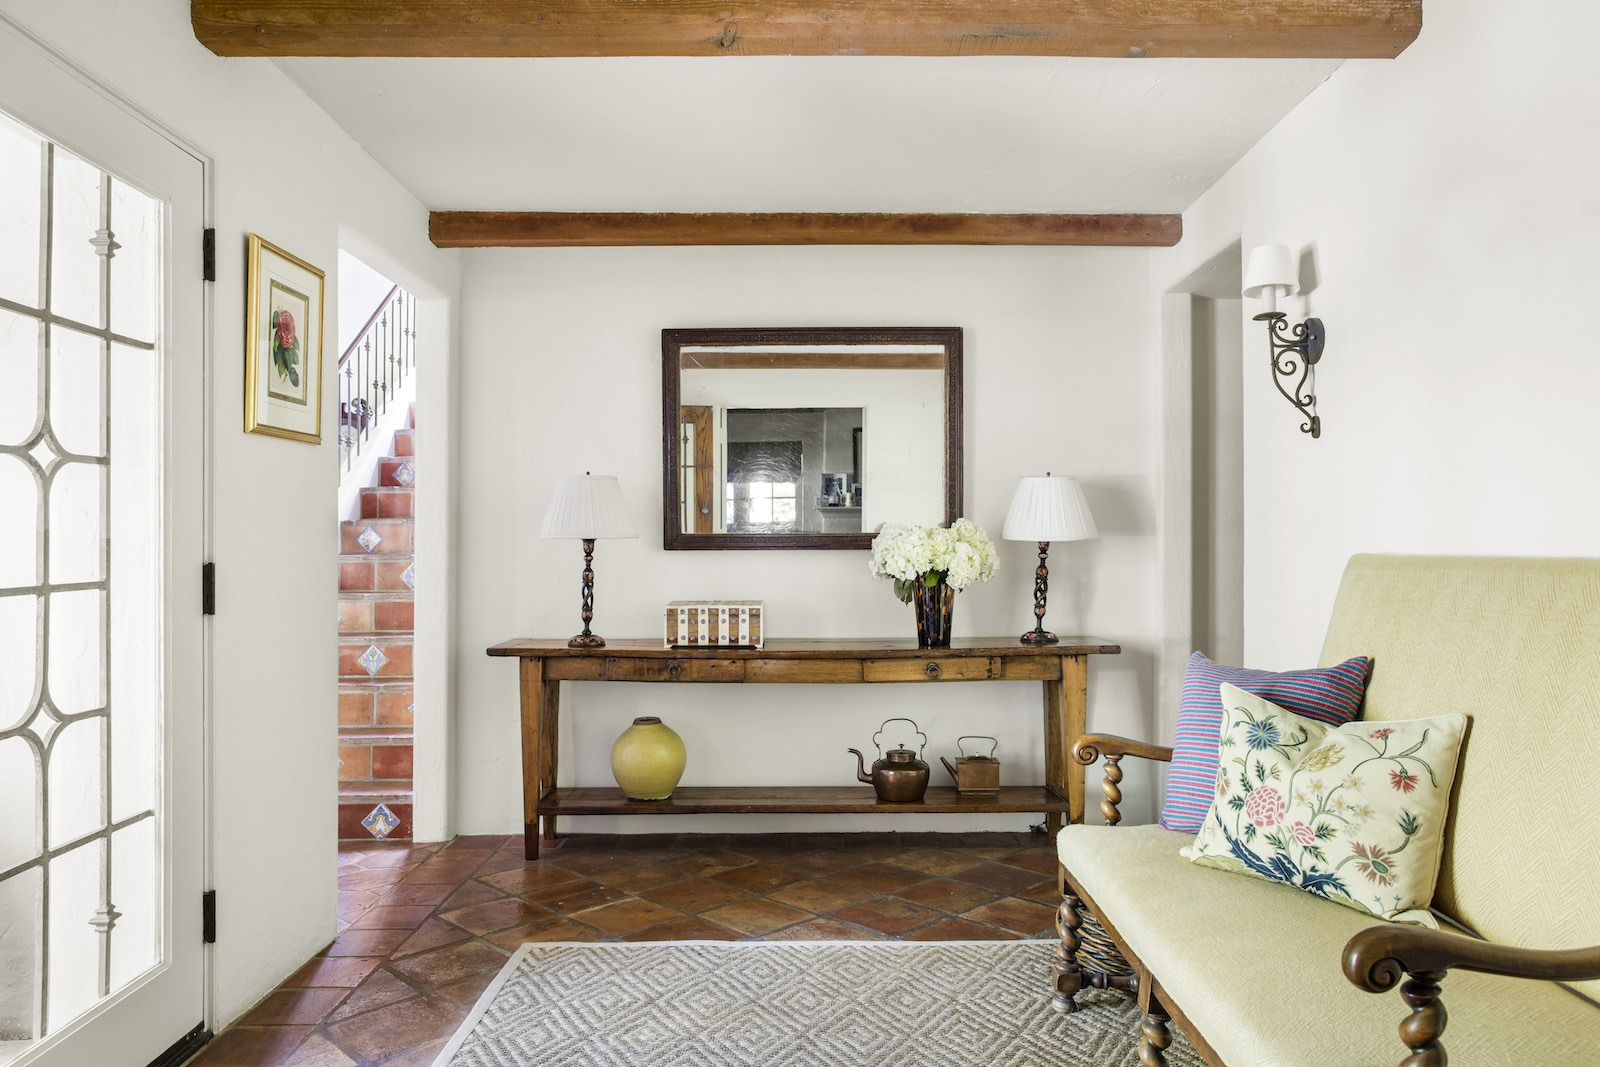 Best pasadena interior designers interior design firm - Interior decorator near me ...